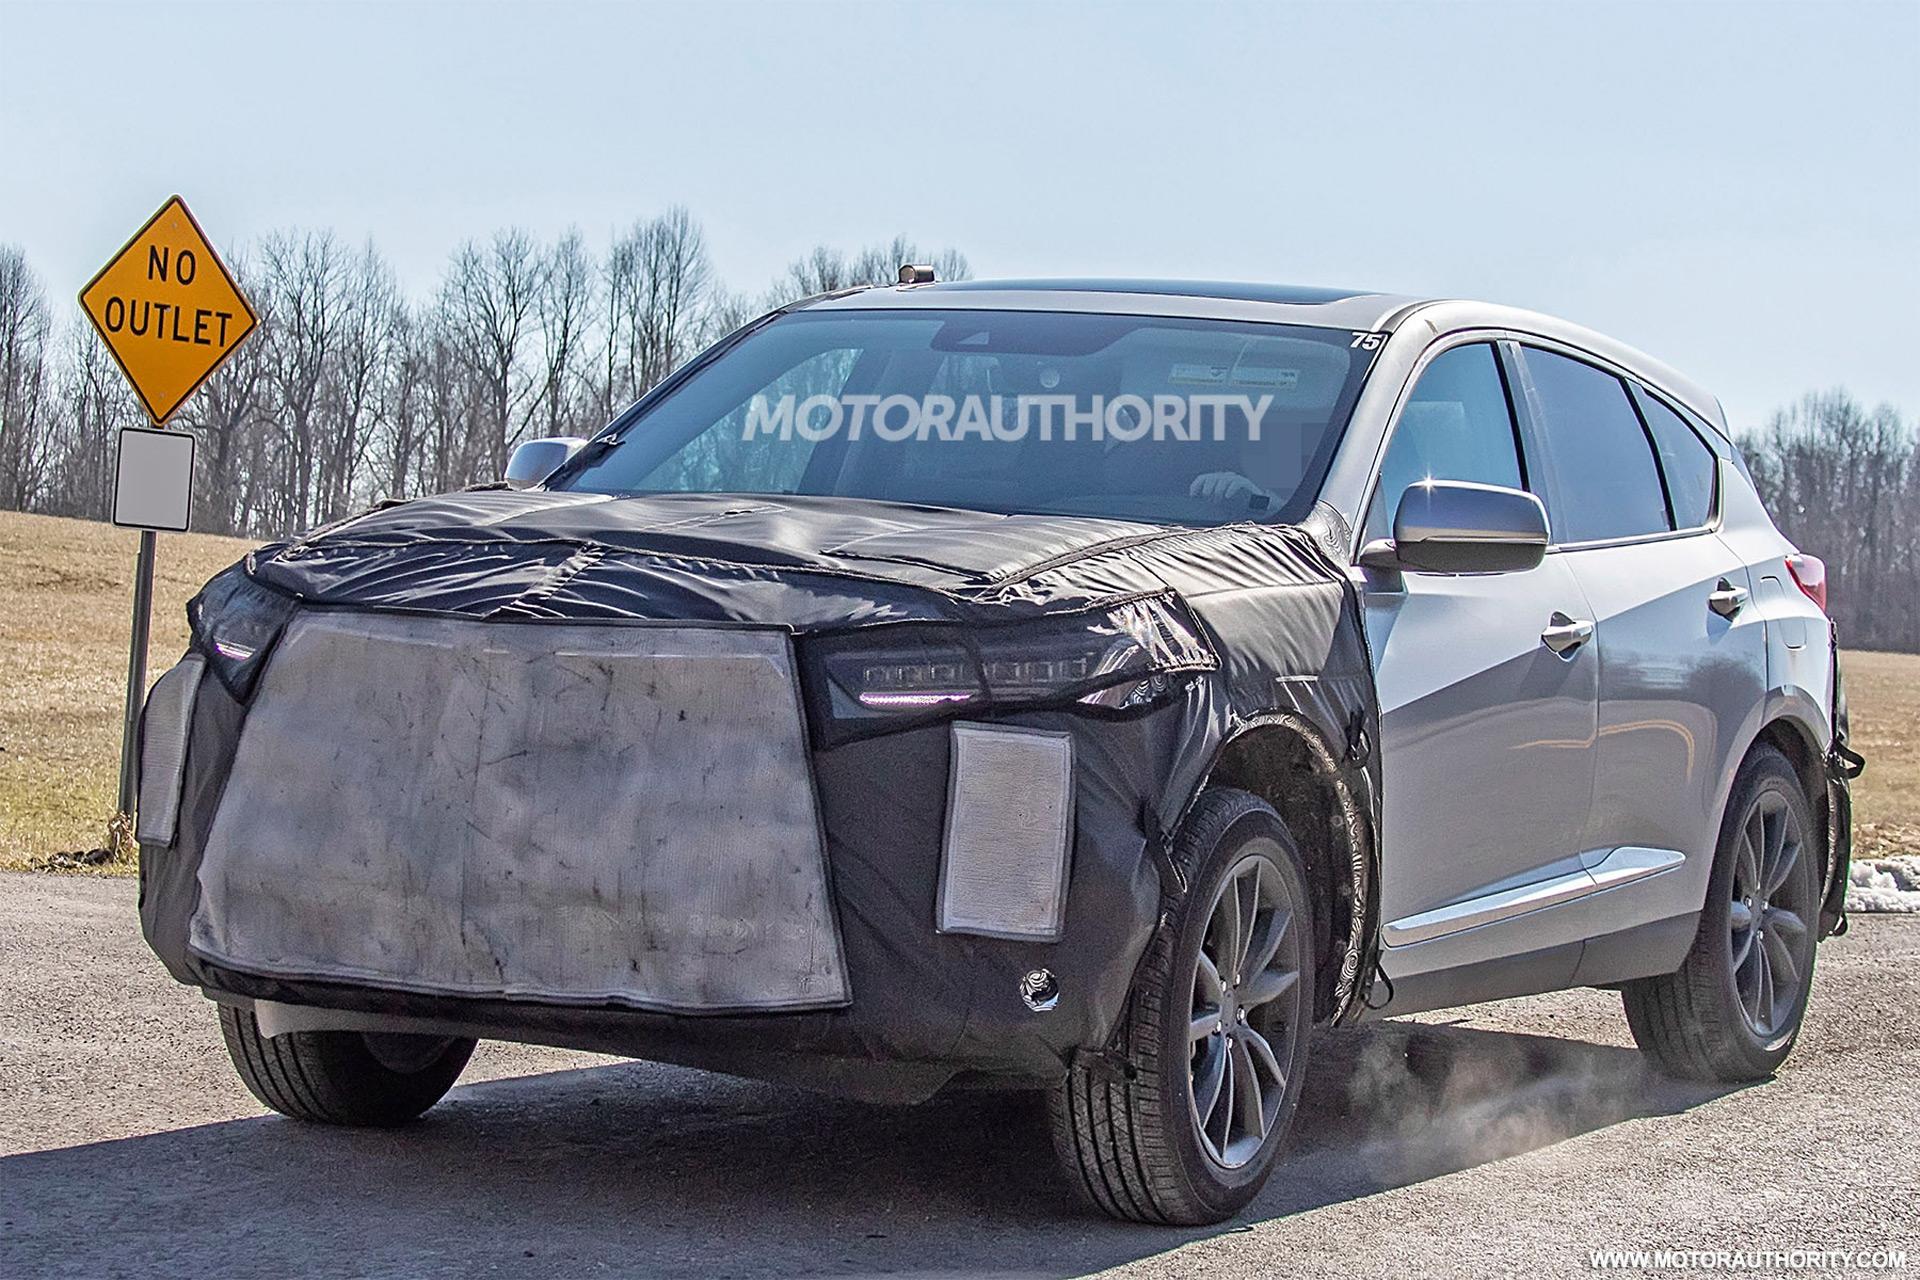 2022 Acura RDX spy shots: Mid-cycle update coming soon